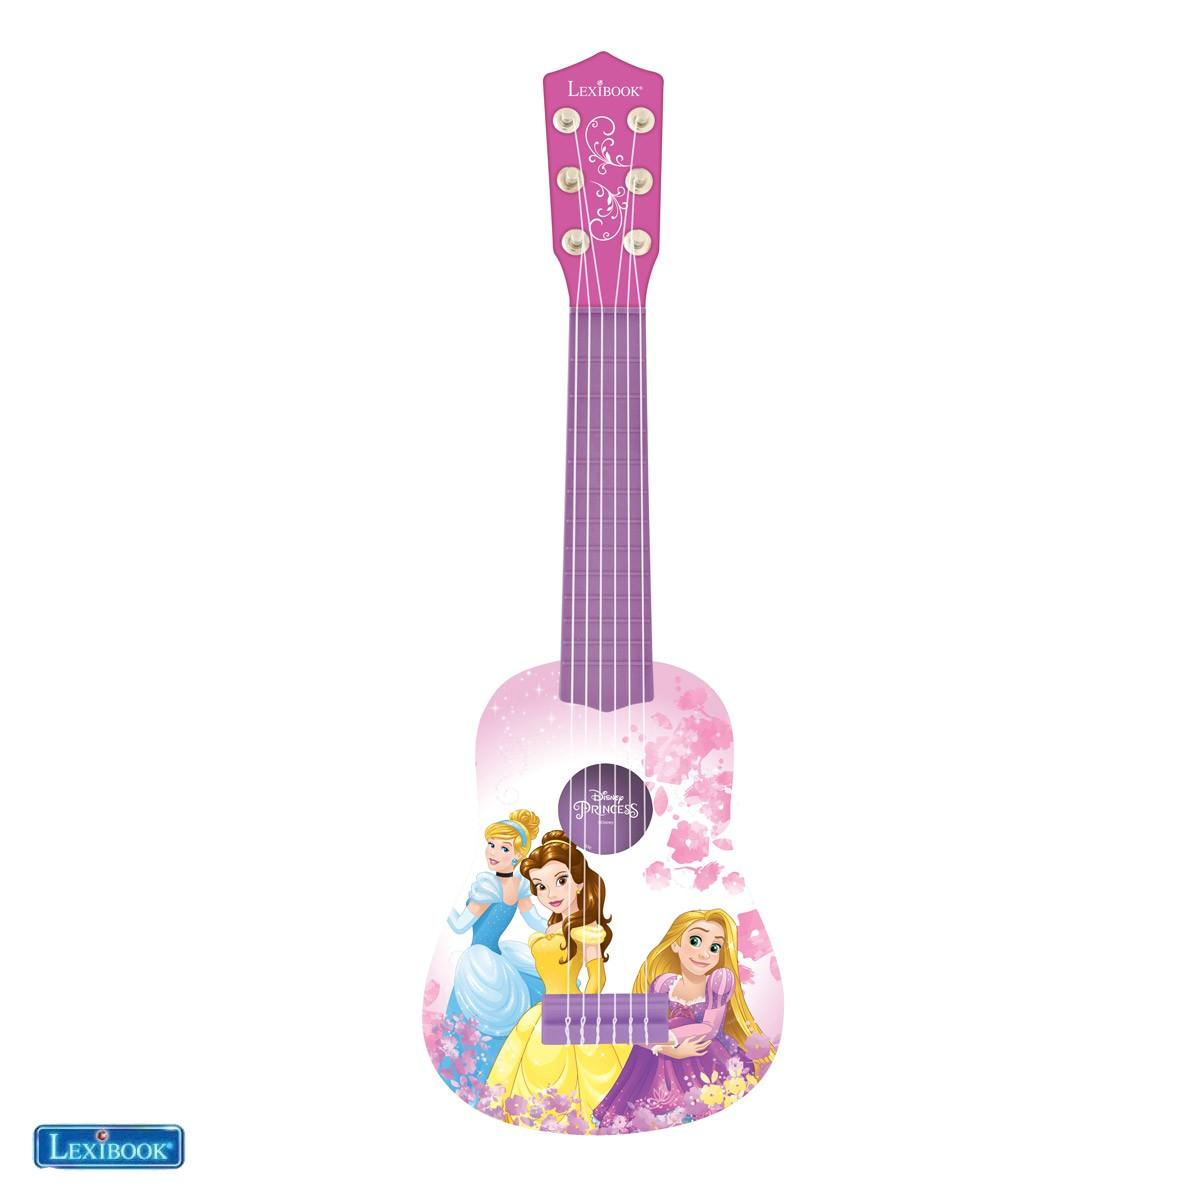 Disney Princesses Raiponce Ma première guitare - Lexibook K200DP_04